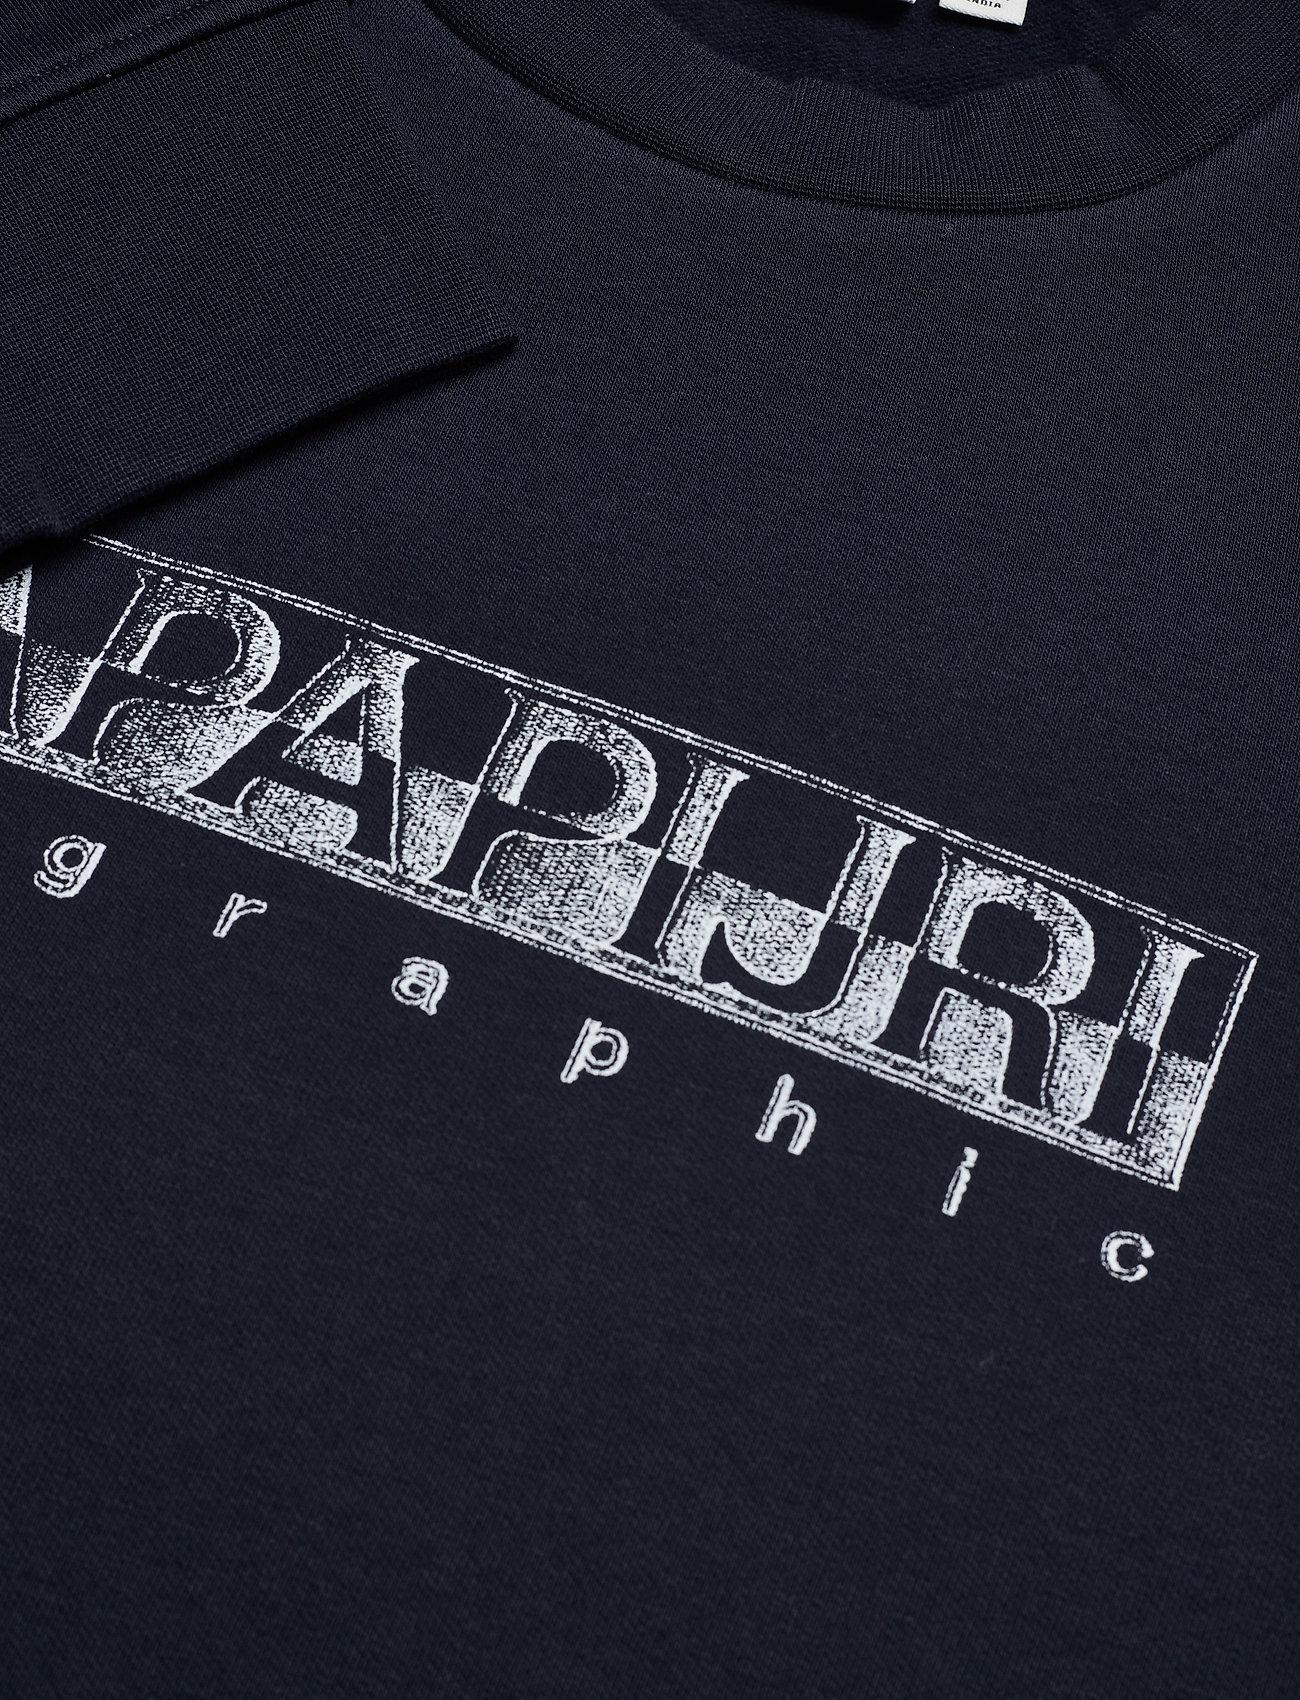 Napapijri - BALLAR C - sweats - blue marine - 2